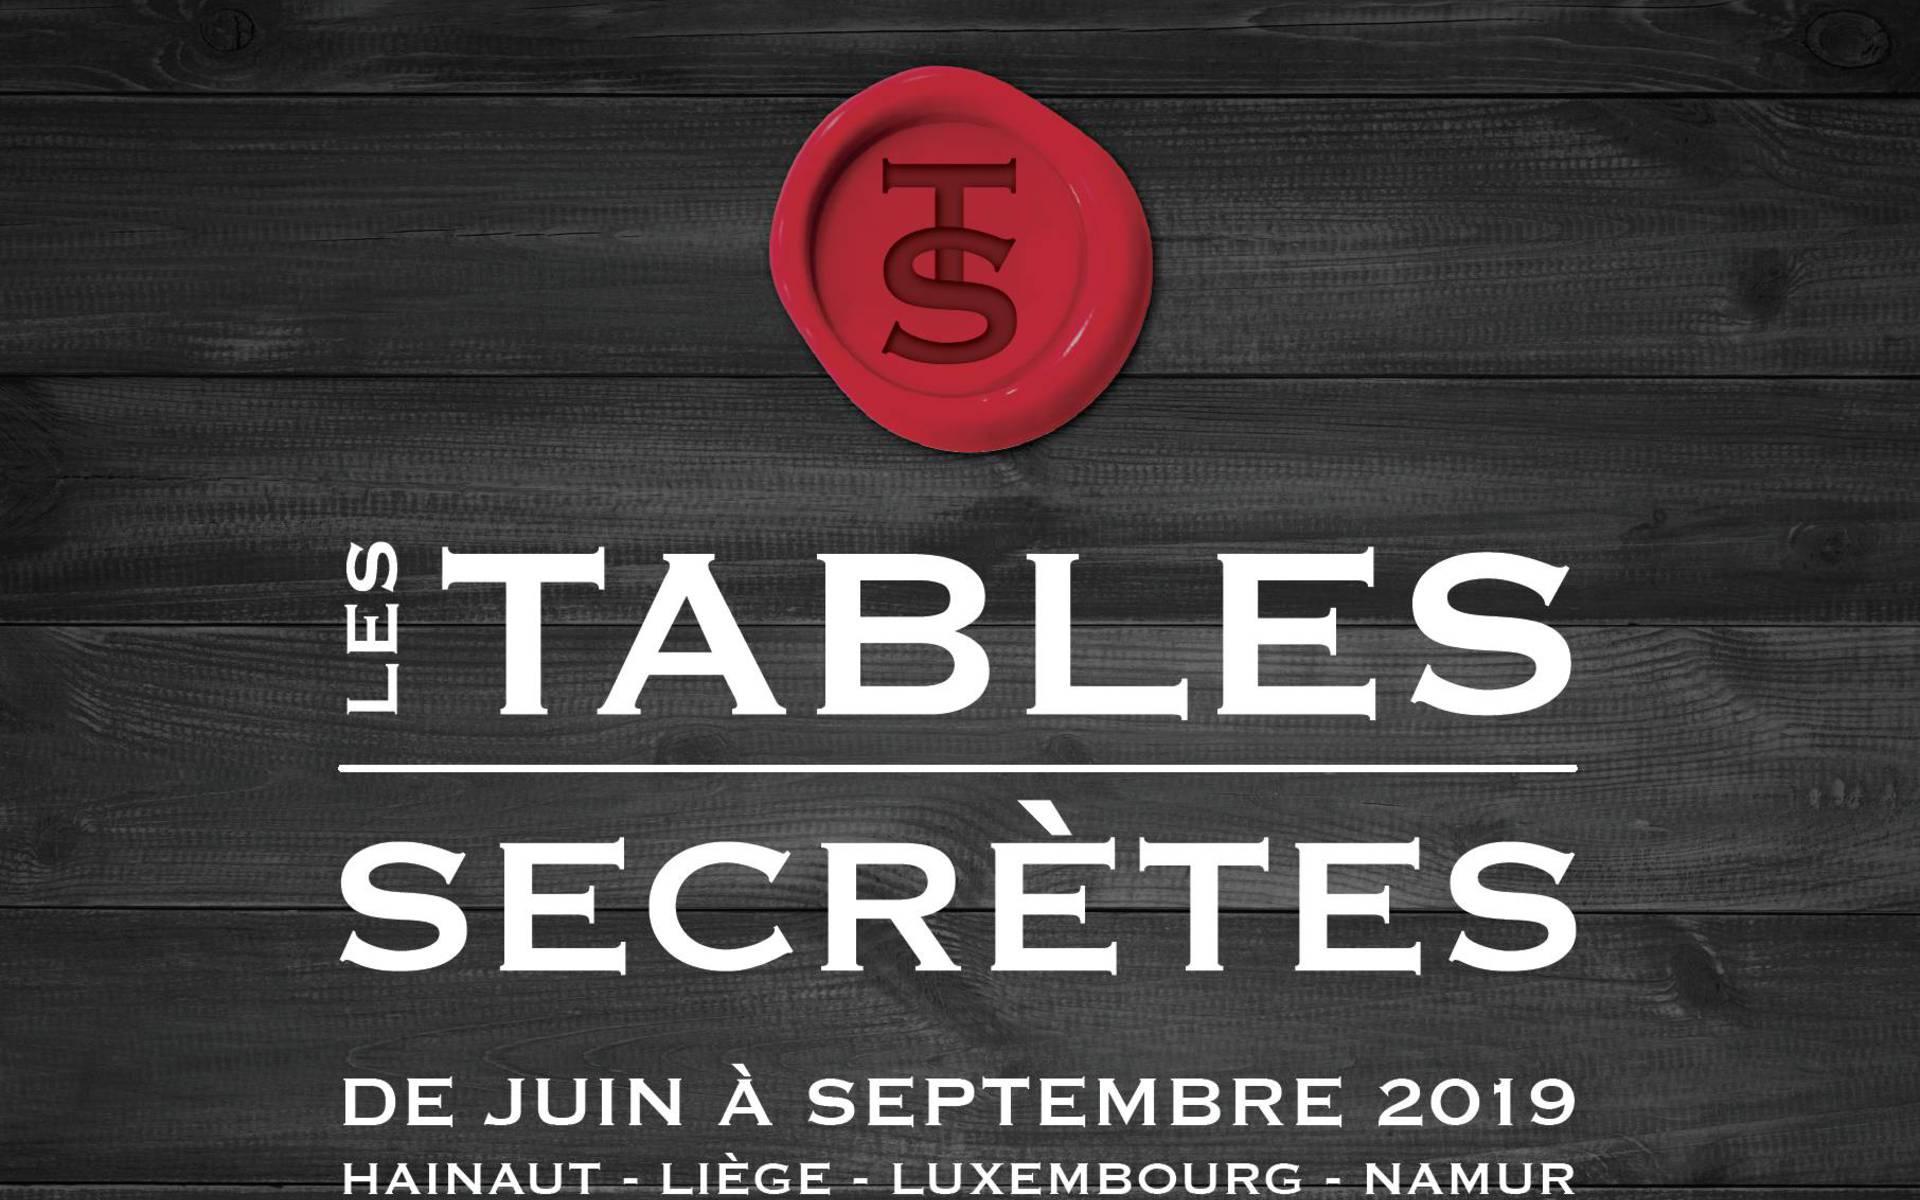 Les Tables Secrètes